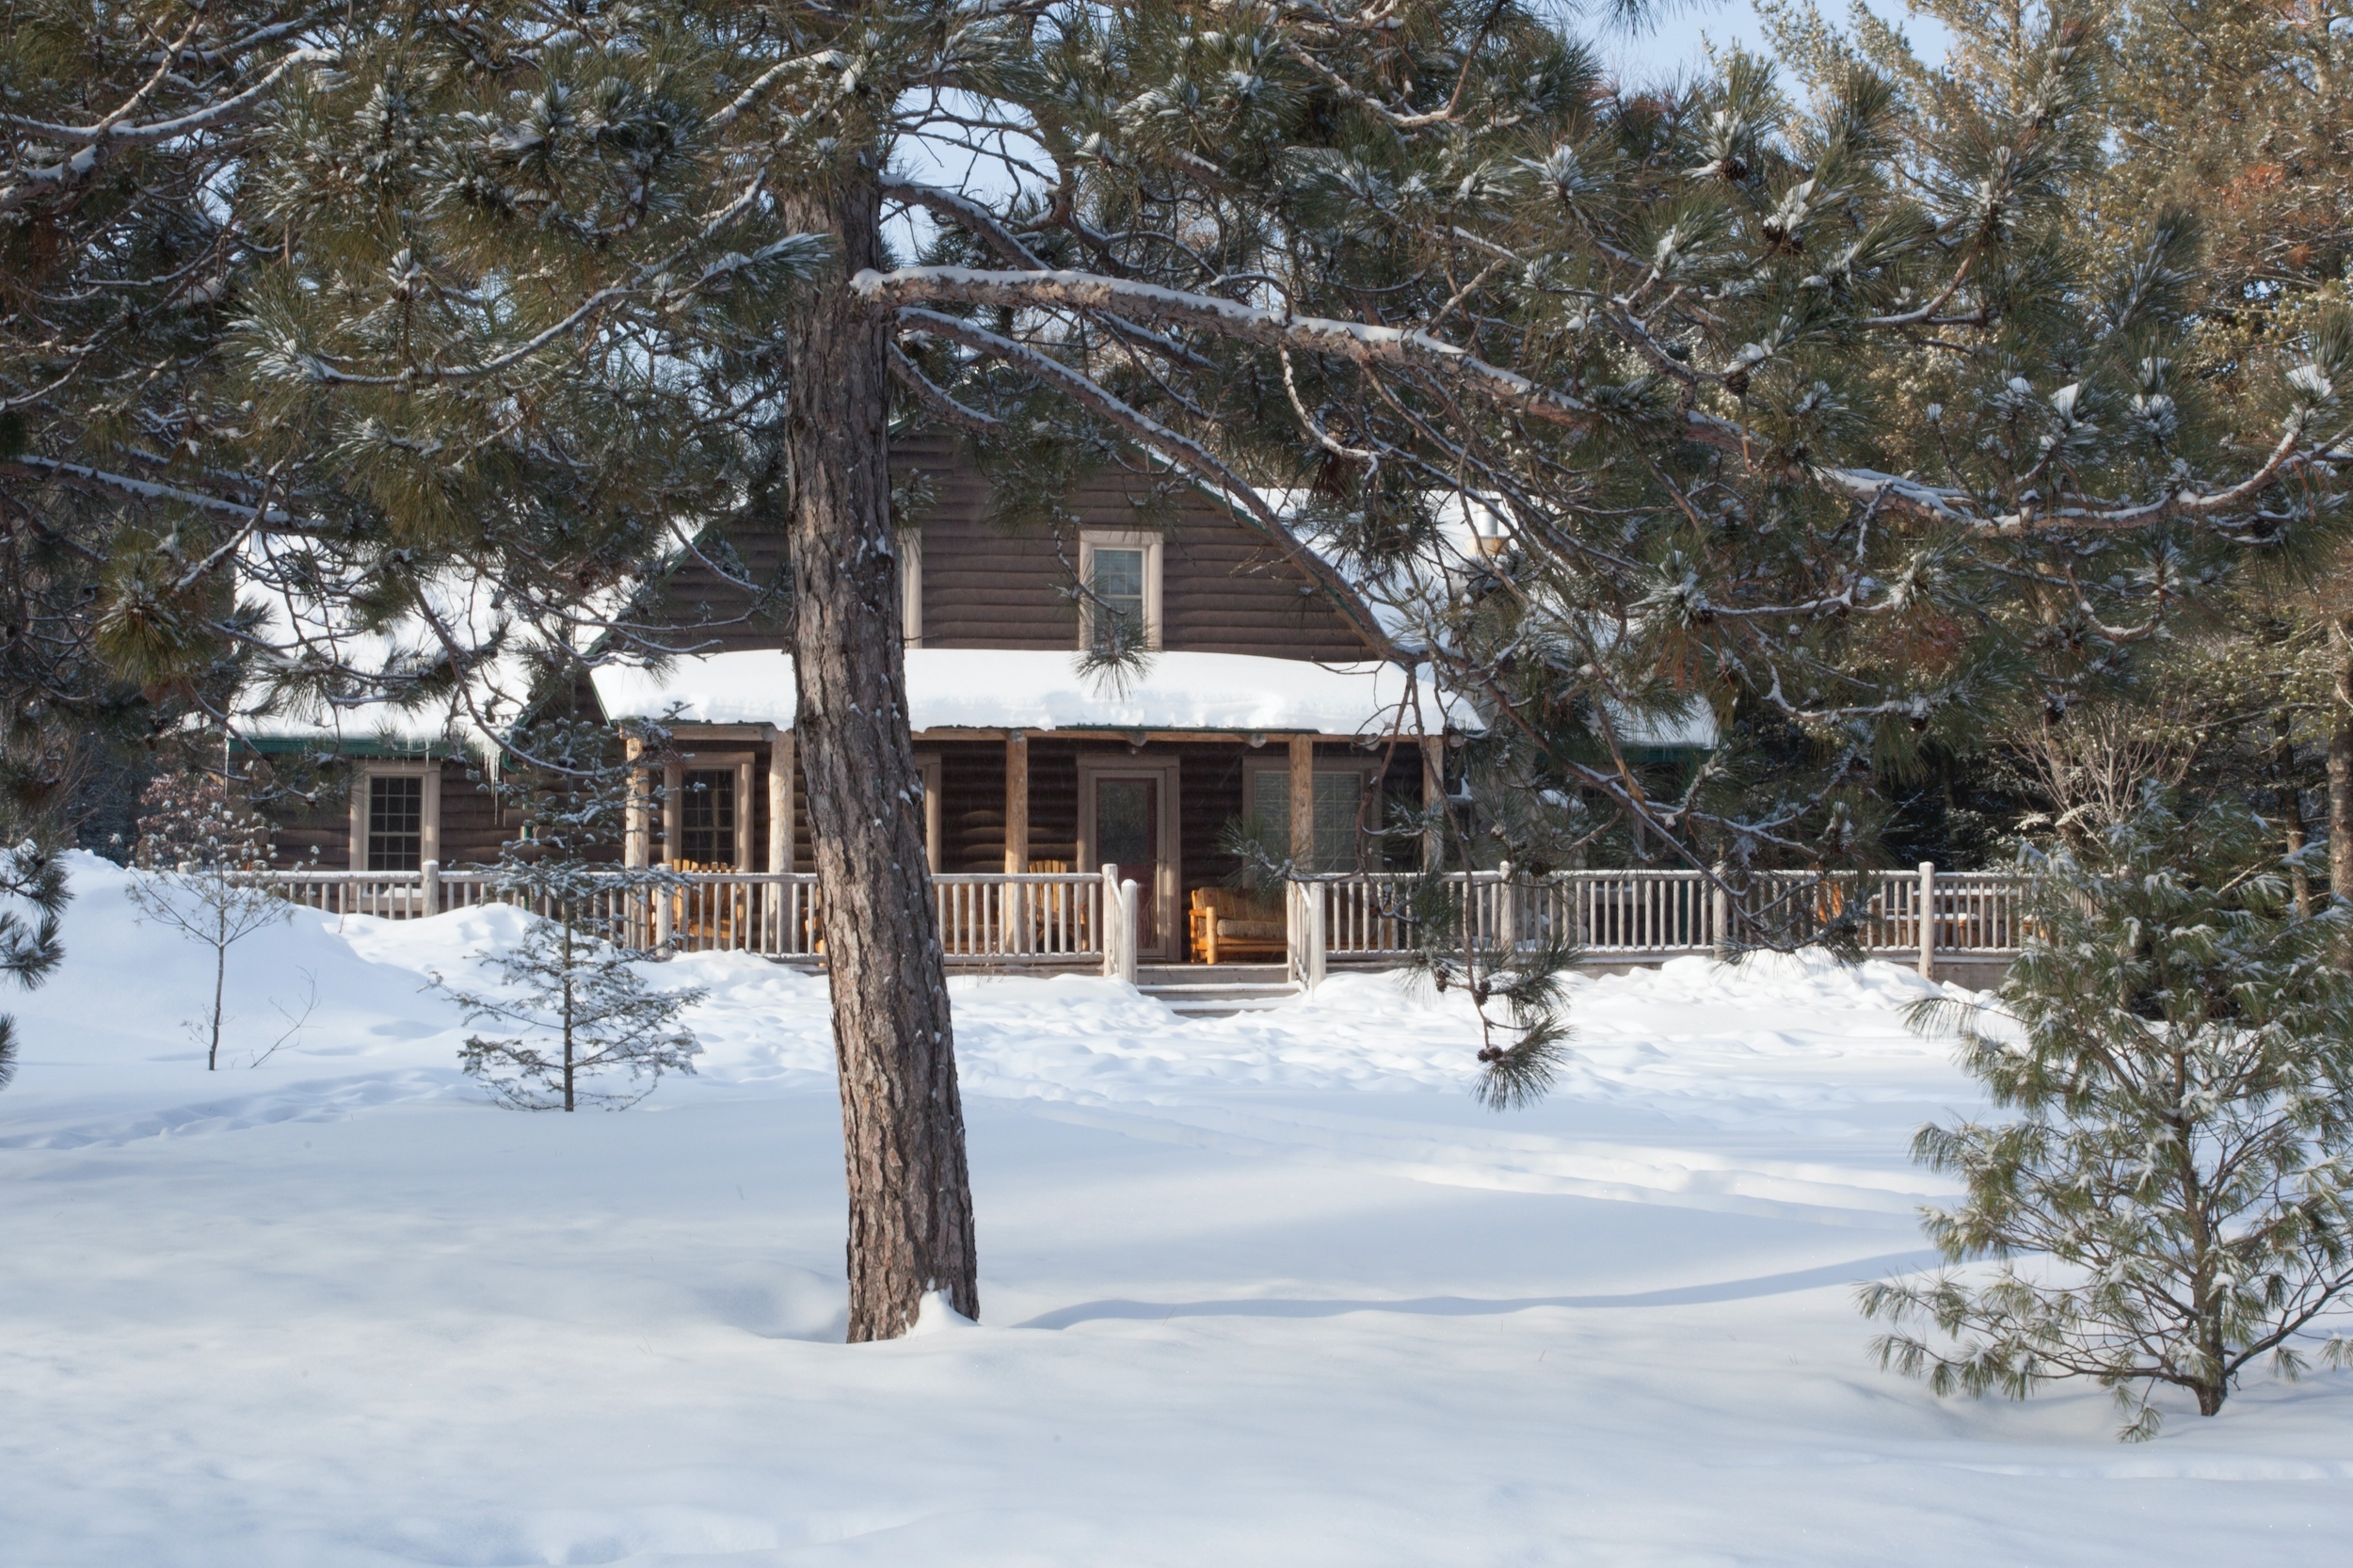 lodge.winter.new.great.ext.jan17.jpg